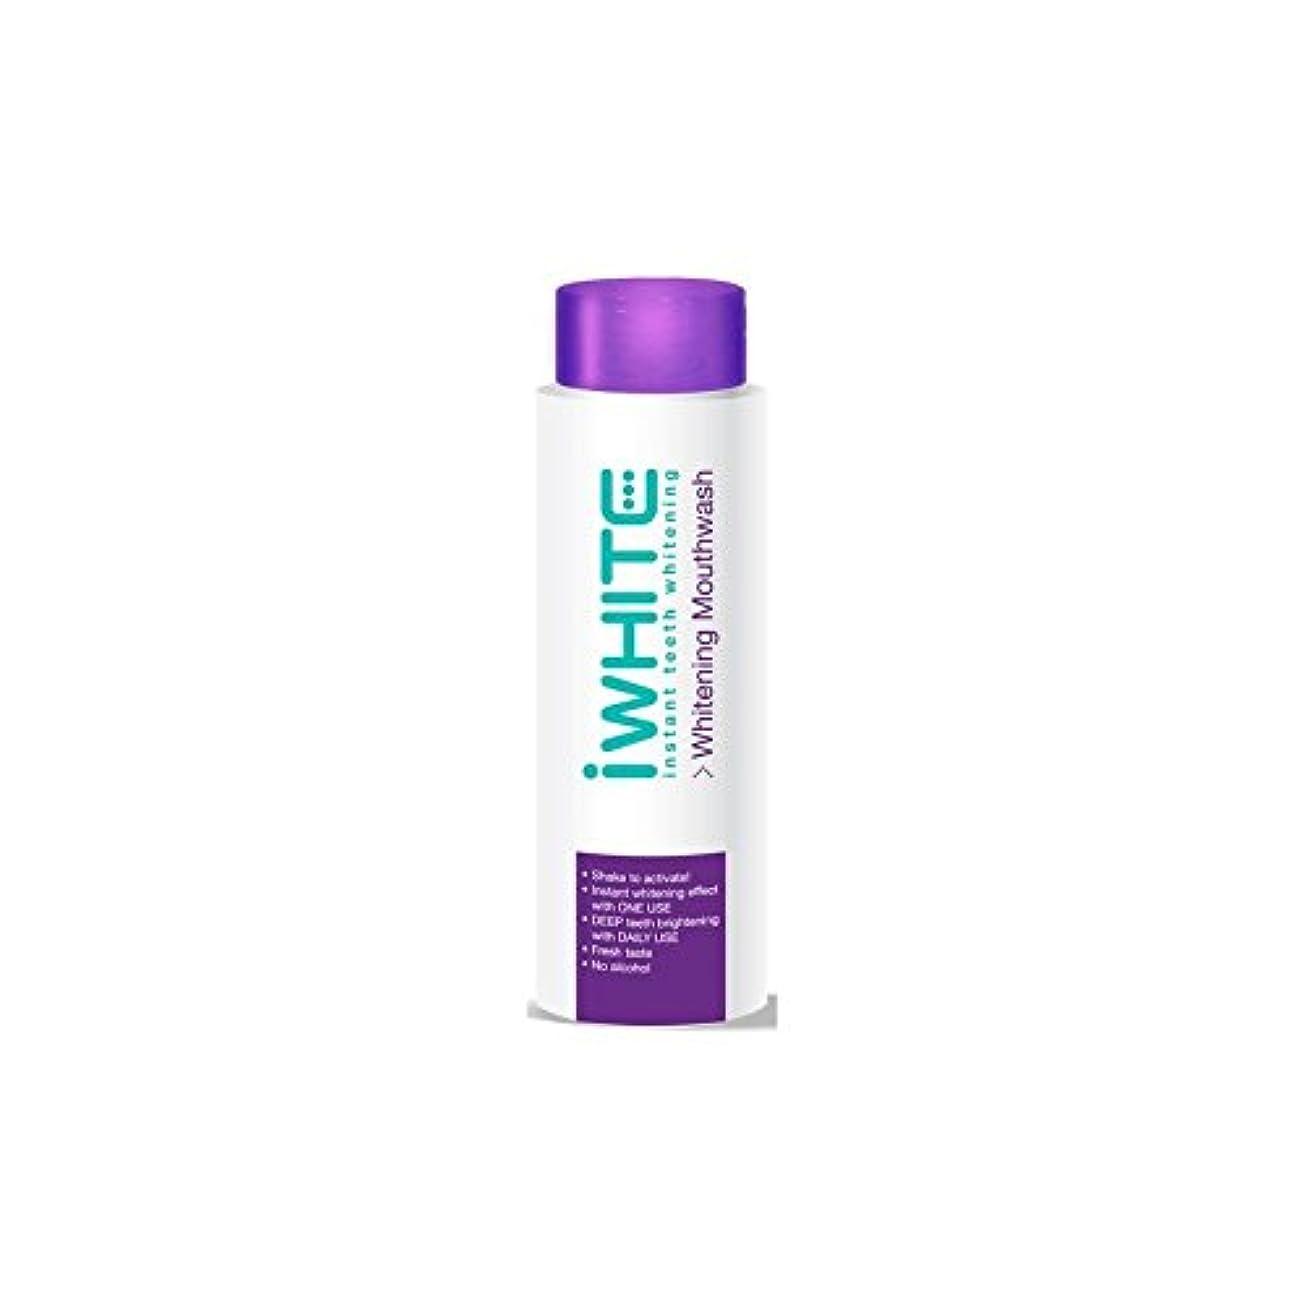 iWhite Instant Teeth Whitening Mouthwash (500ml) (Pack of 6) - うがい薬を白くインスタント歯(500ミリリットル) x6 [並行輸入品]